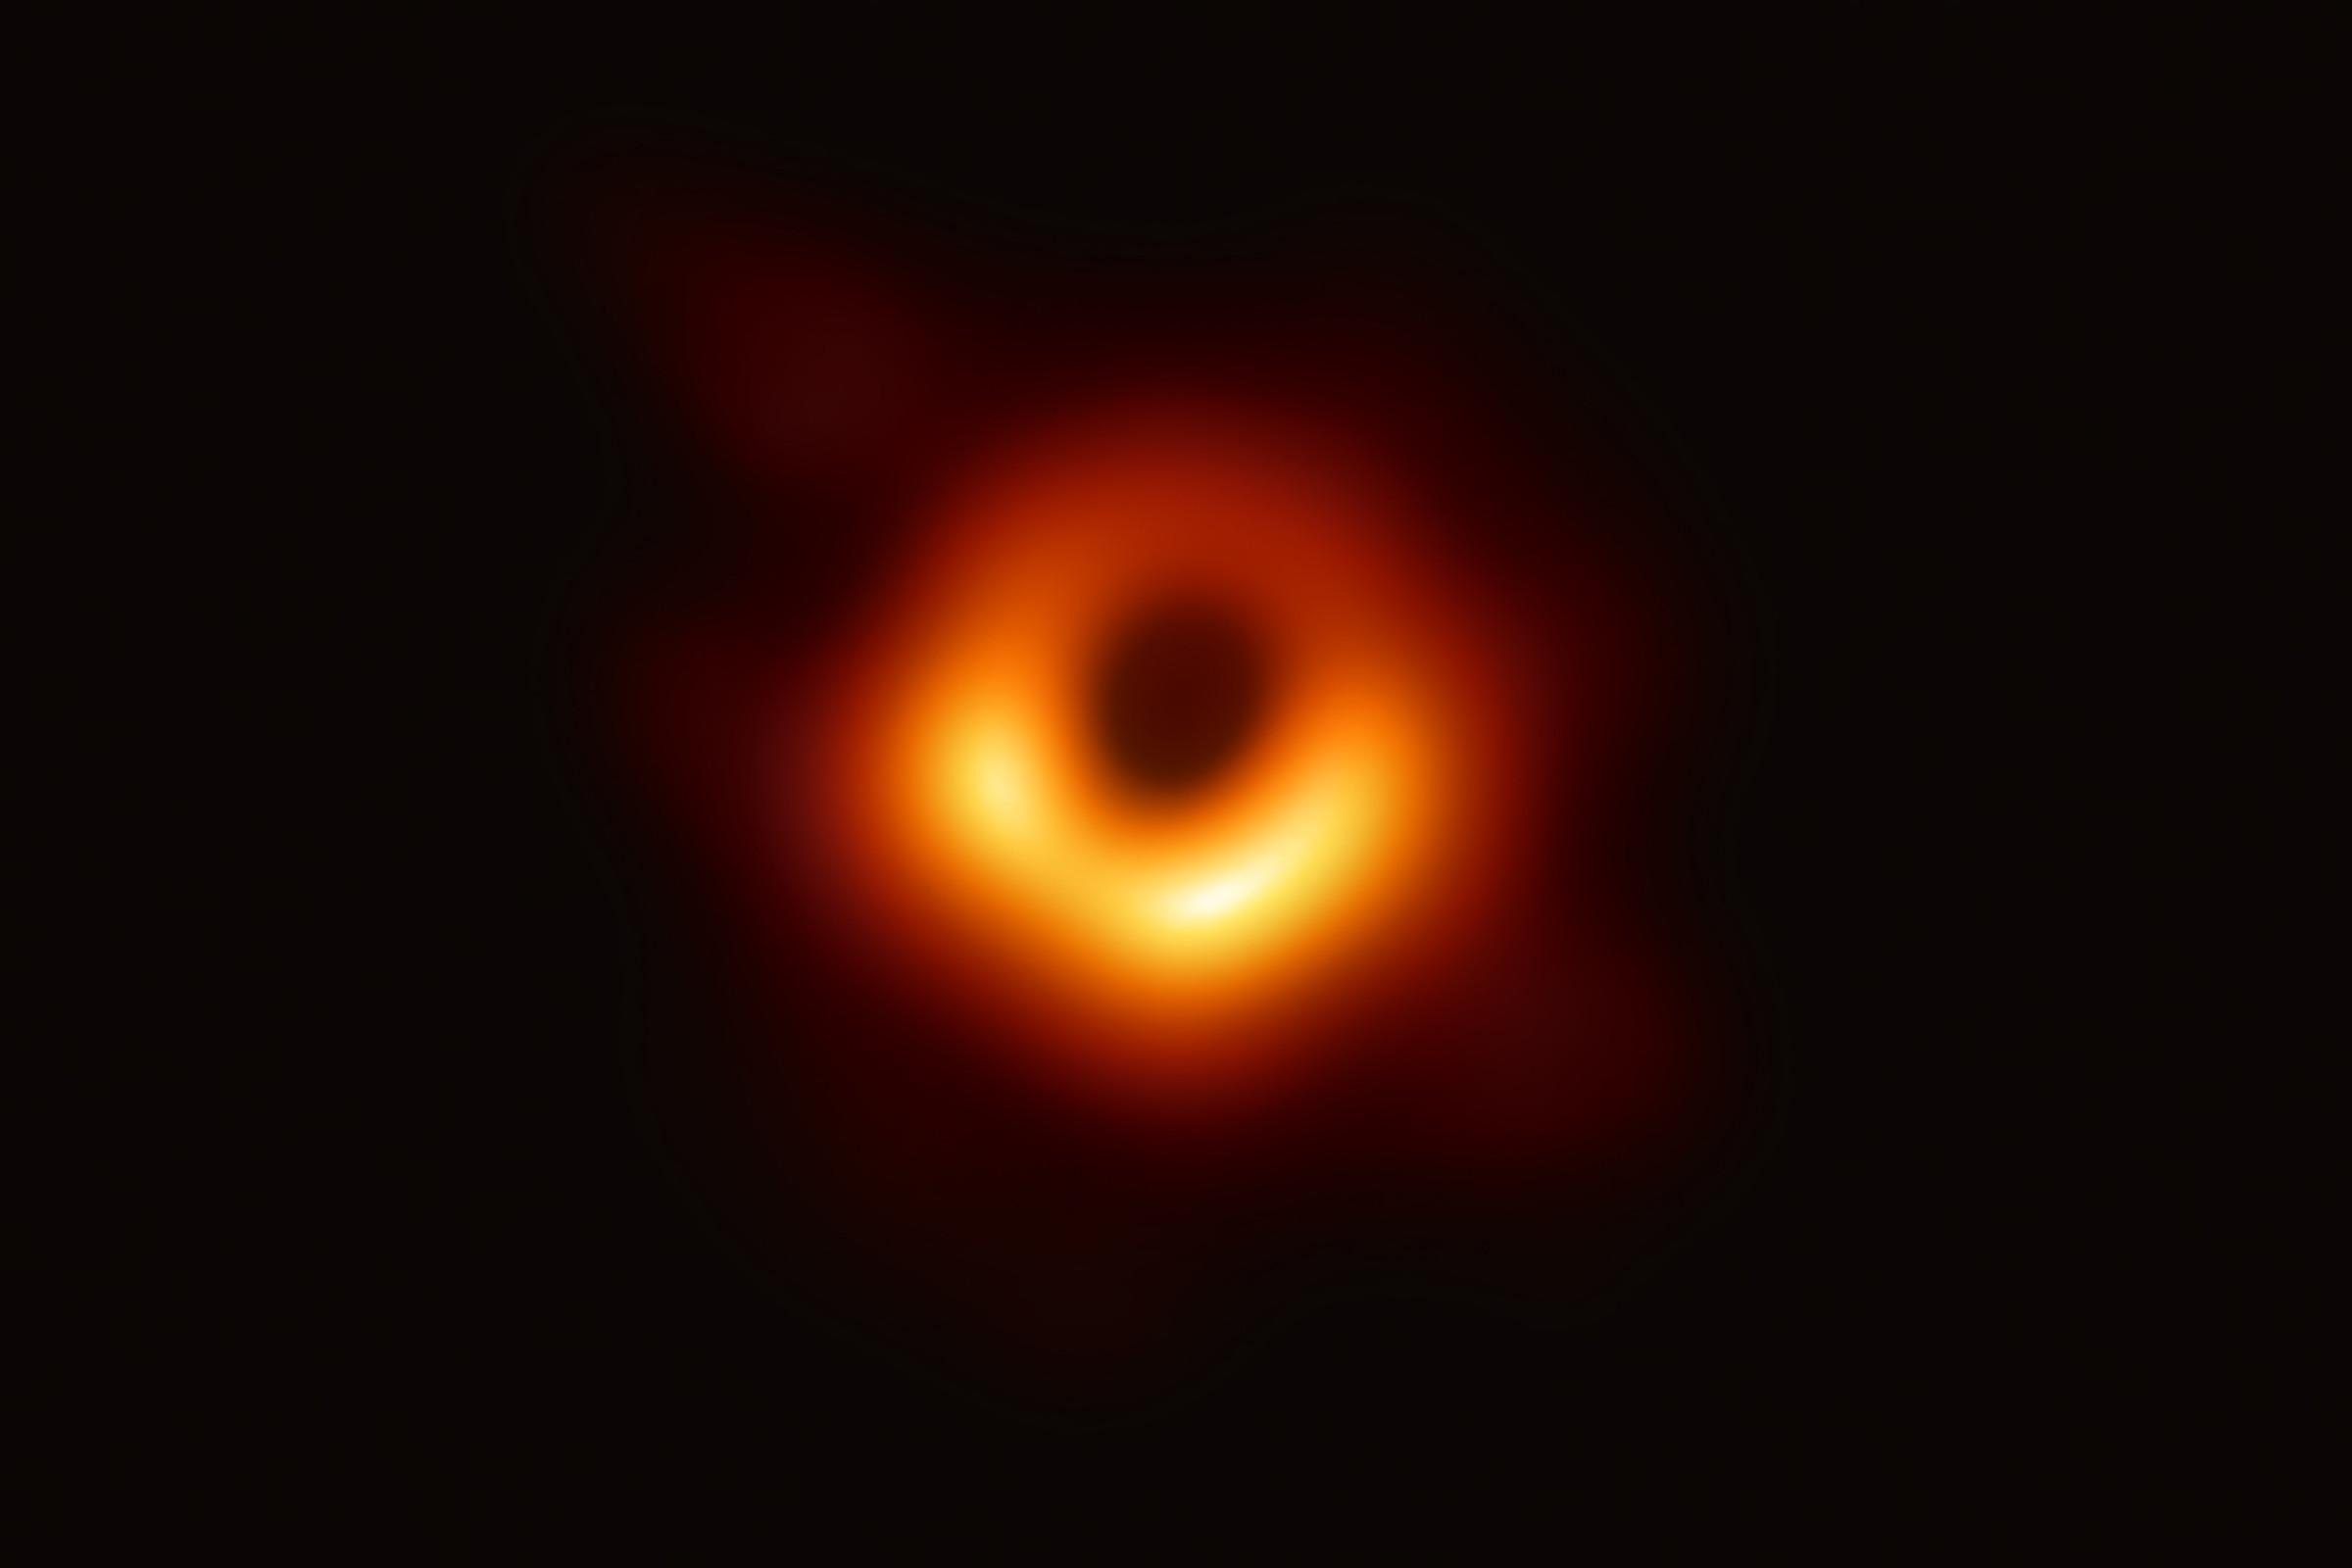 black-hole-photo.jpg